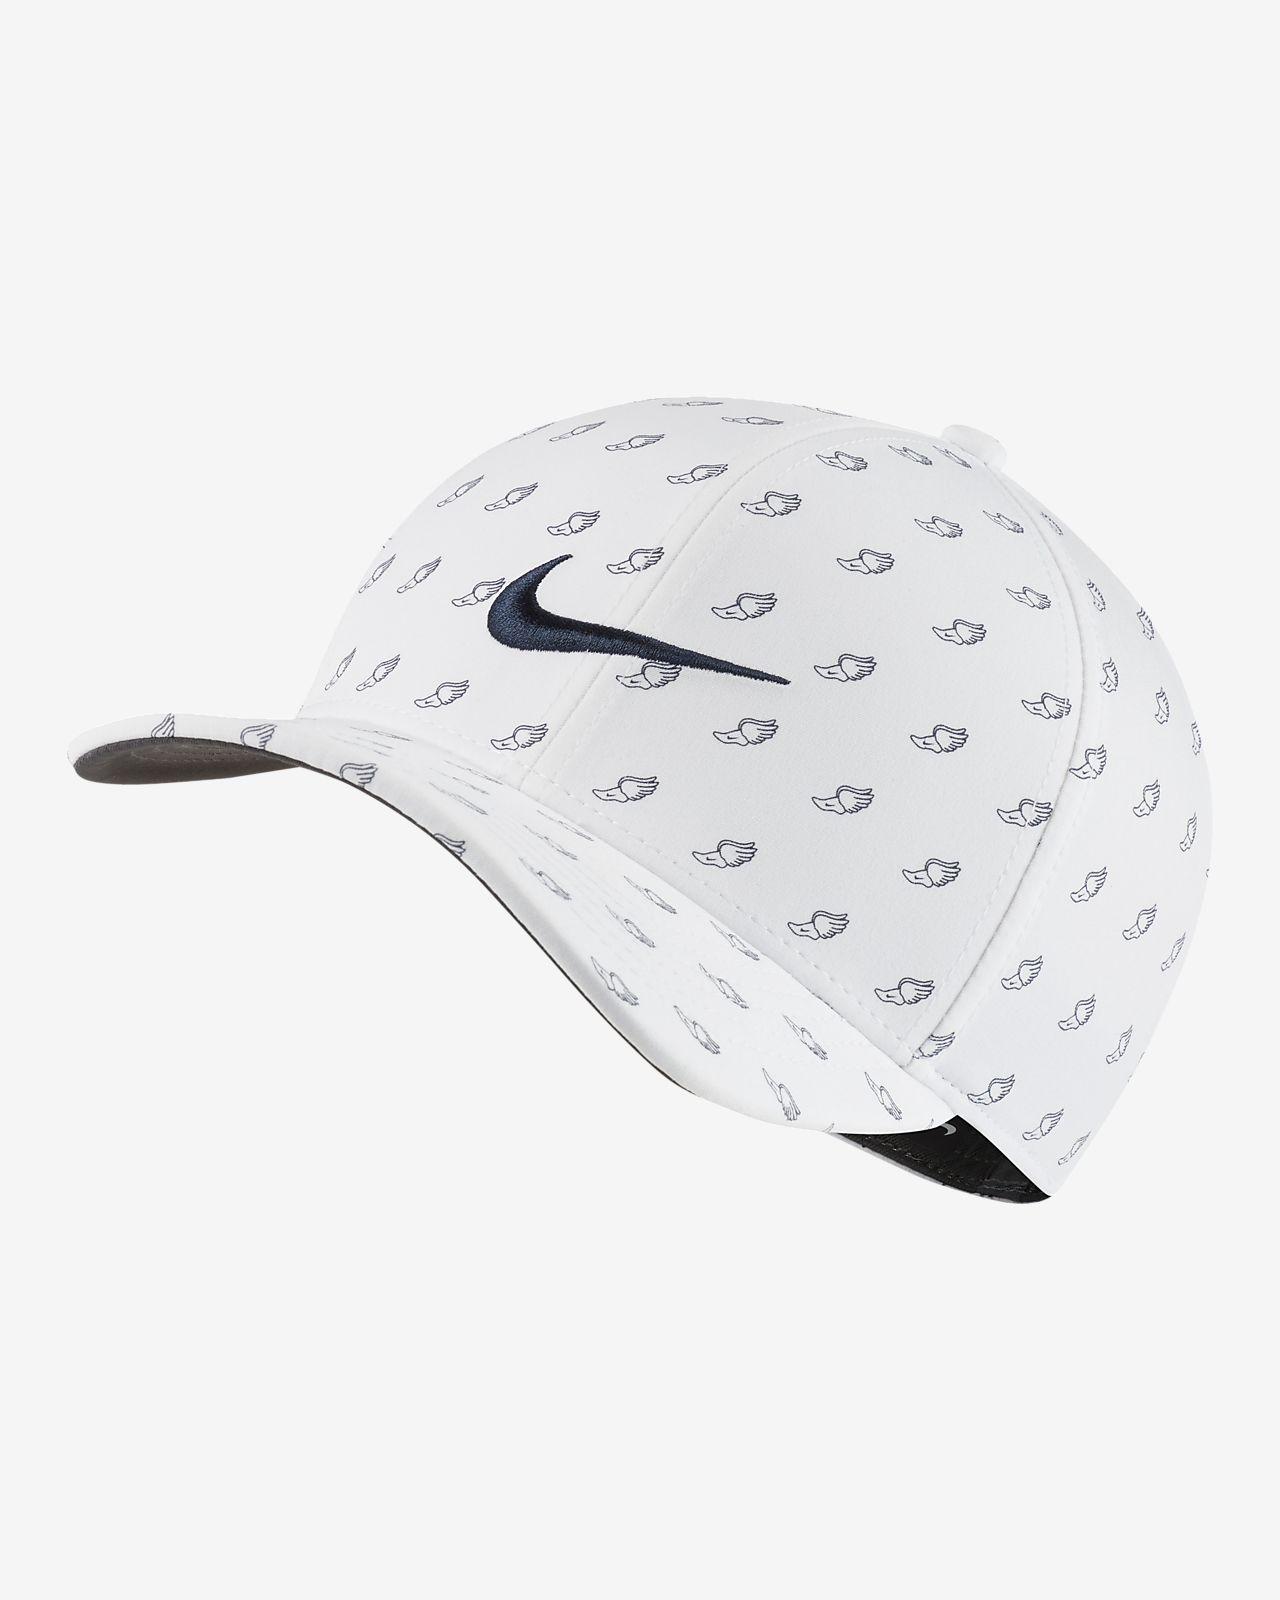 Nike AeroBill Classic99 Golf Hat